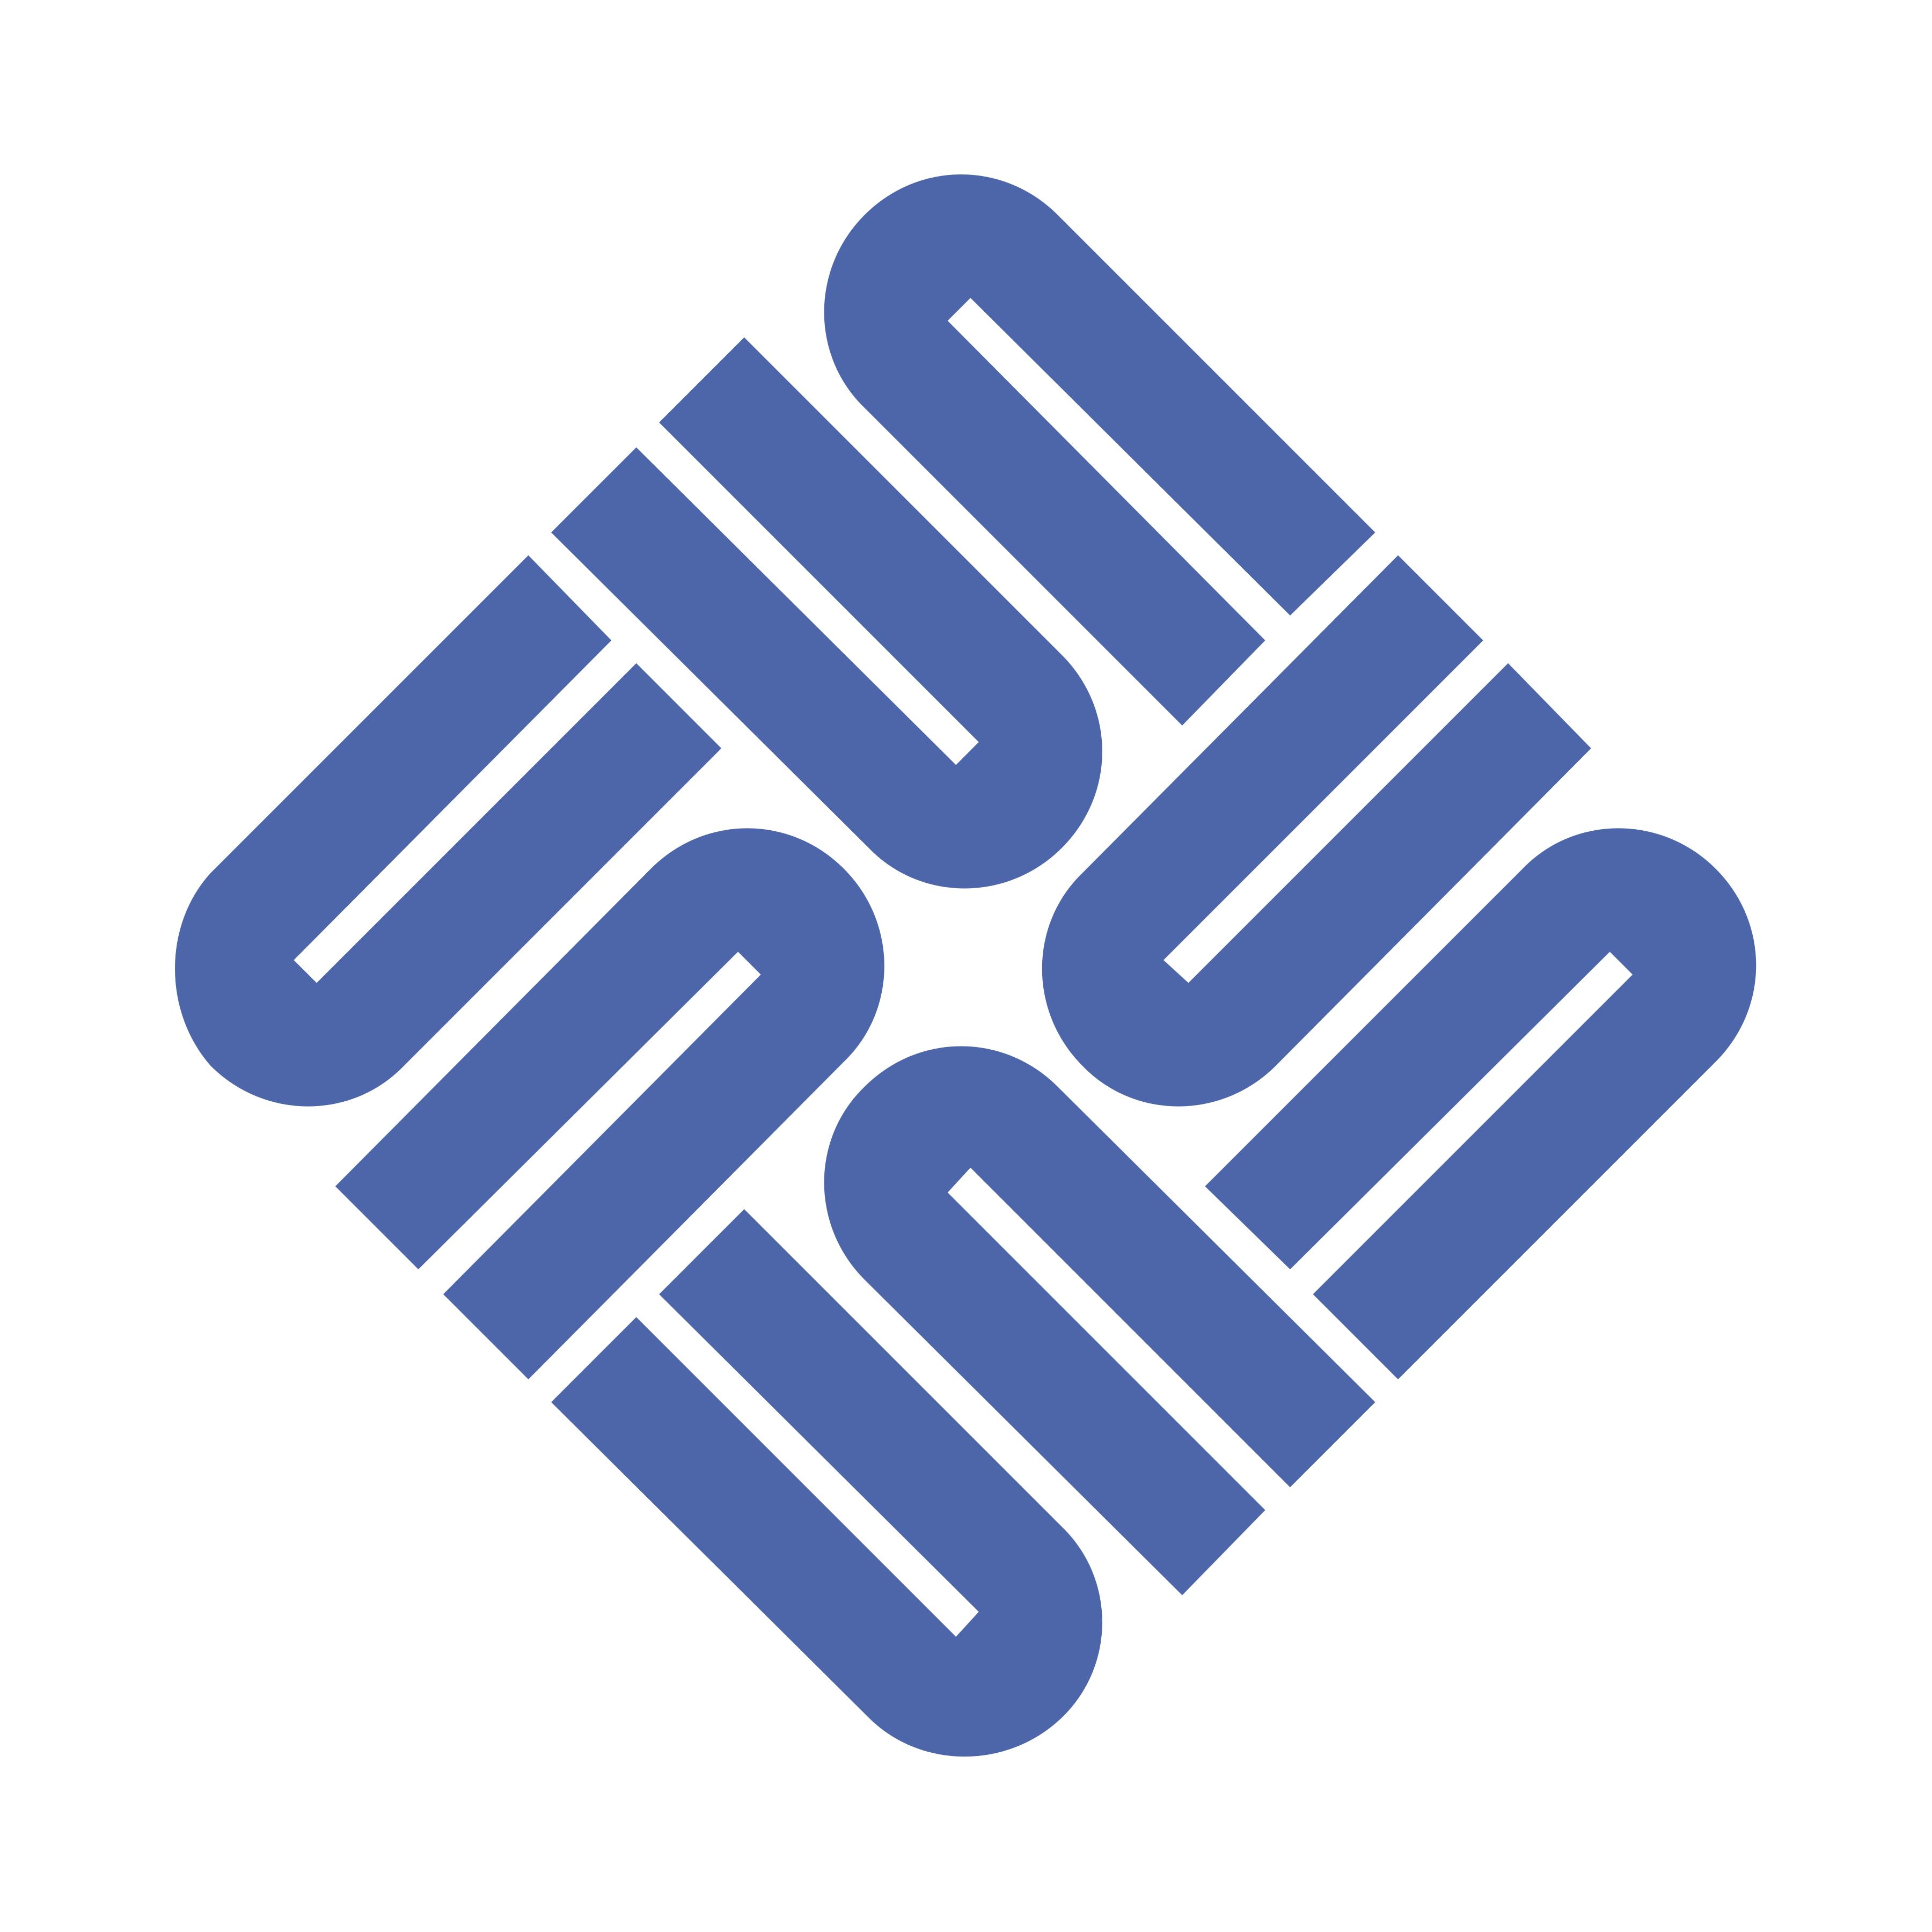 File:SUN microsystems logo ambigram.png.